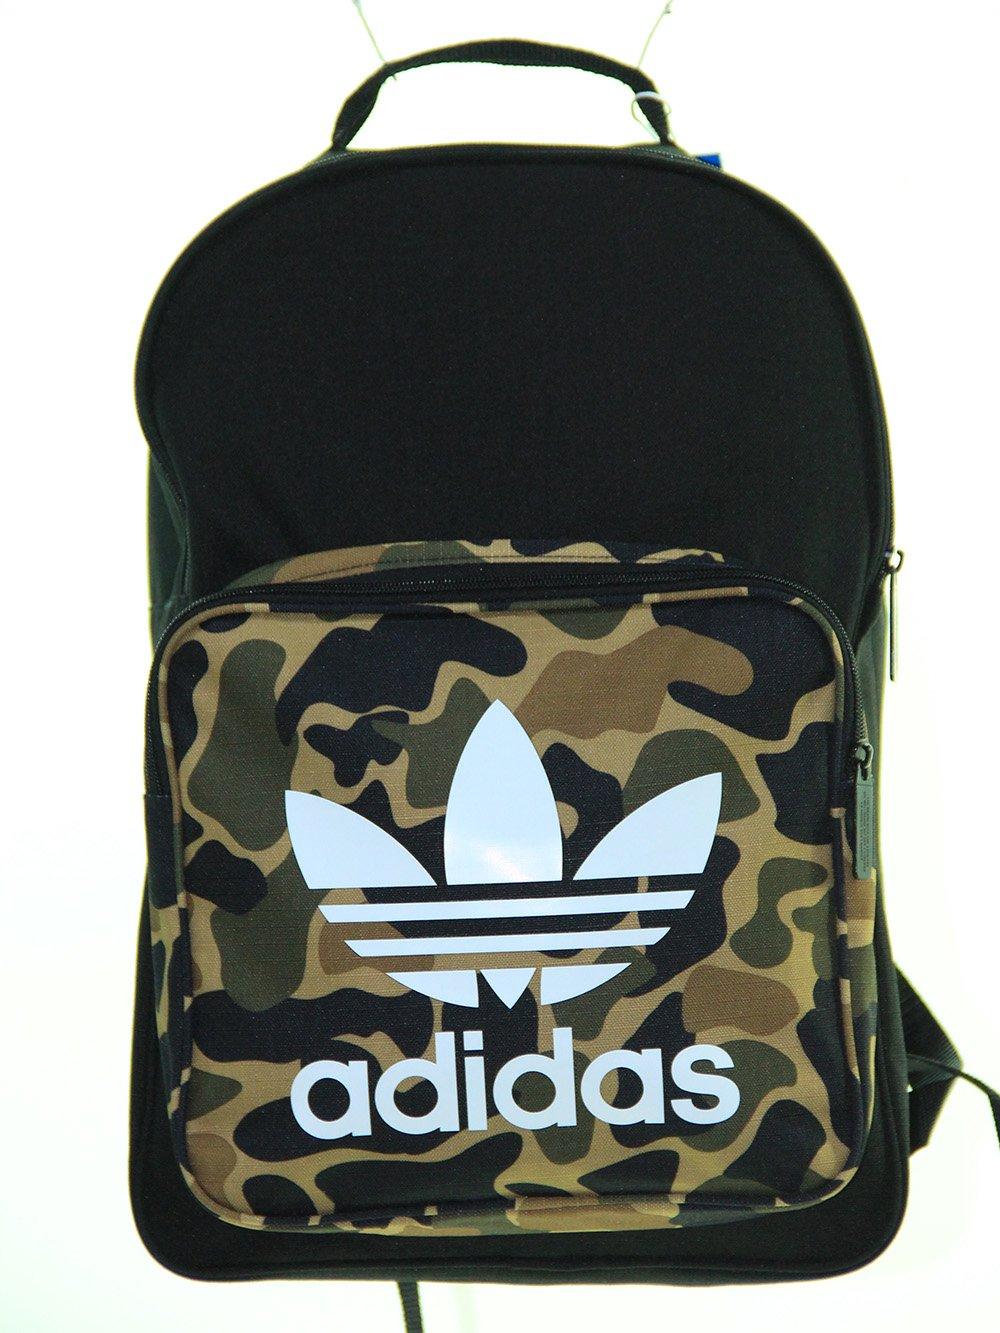 ceddc09d1c2 Mochila Adidas Classic Camo - Camuflado - Session Store